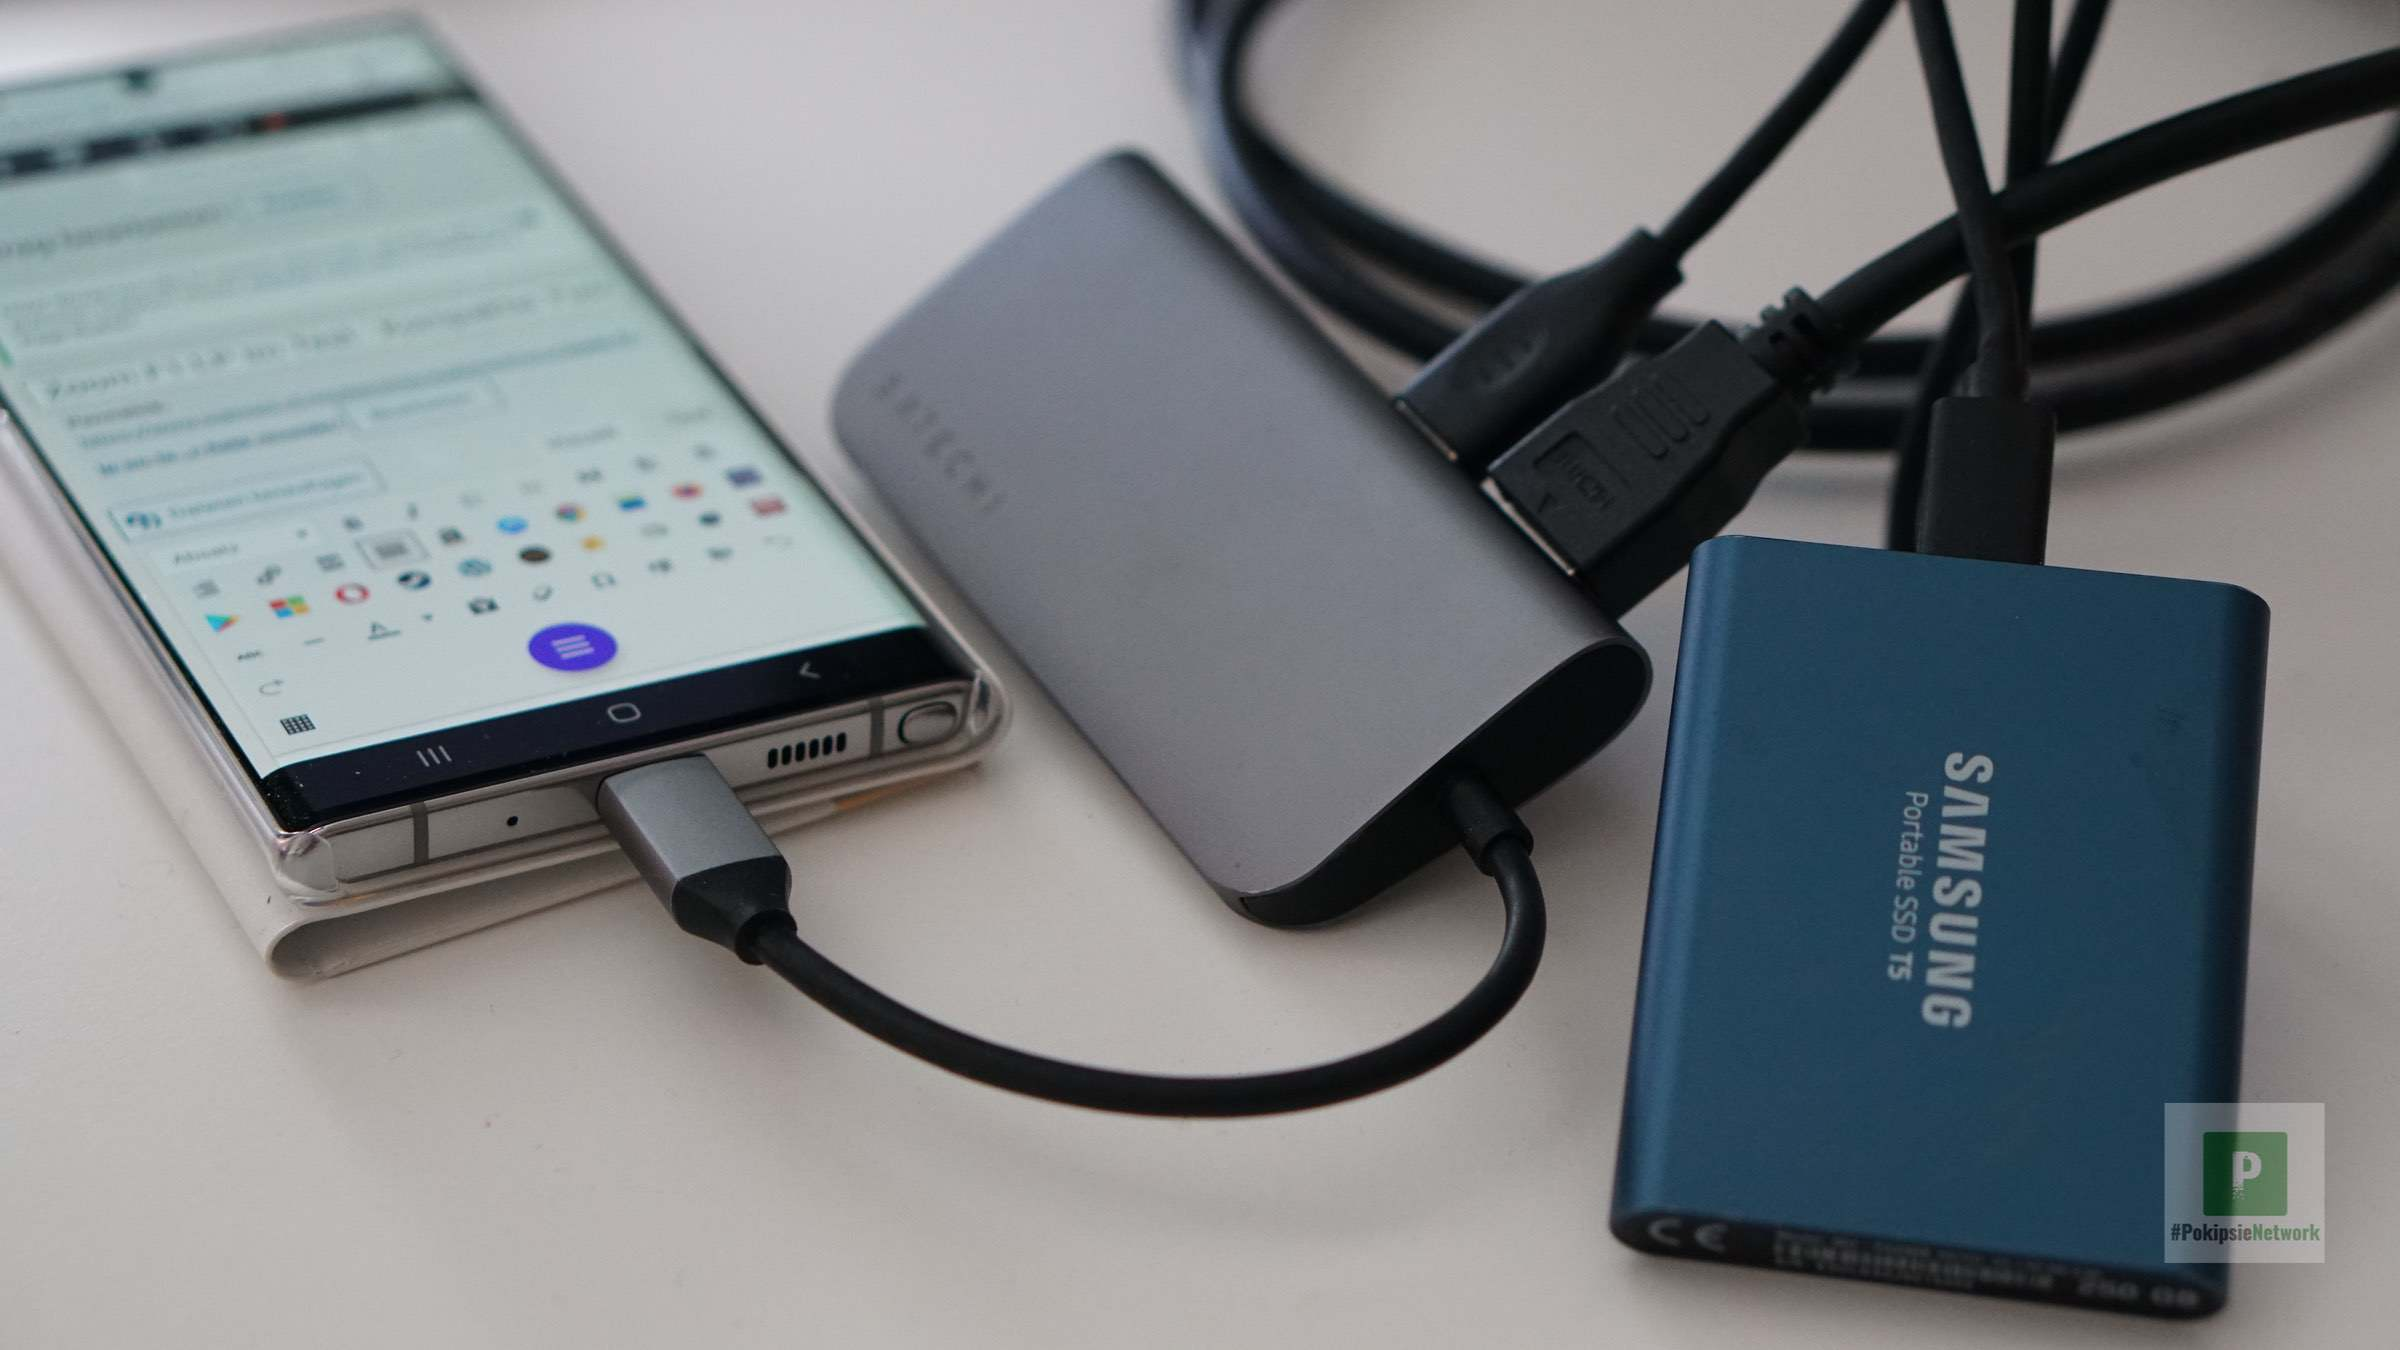 Samsung DeX – Home-Office in kompakt?